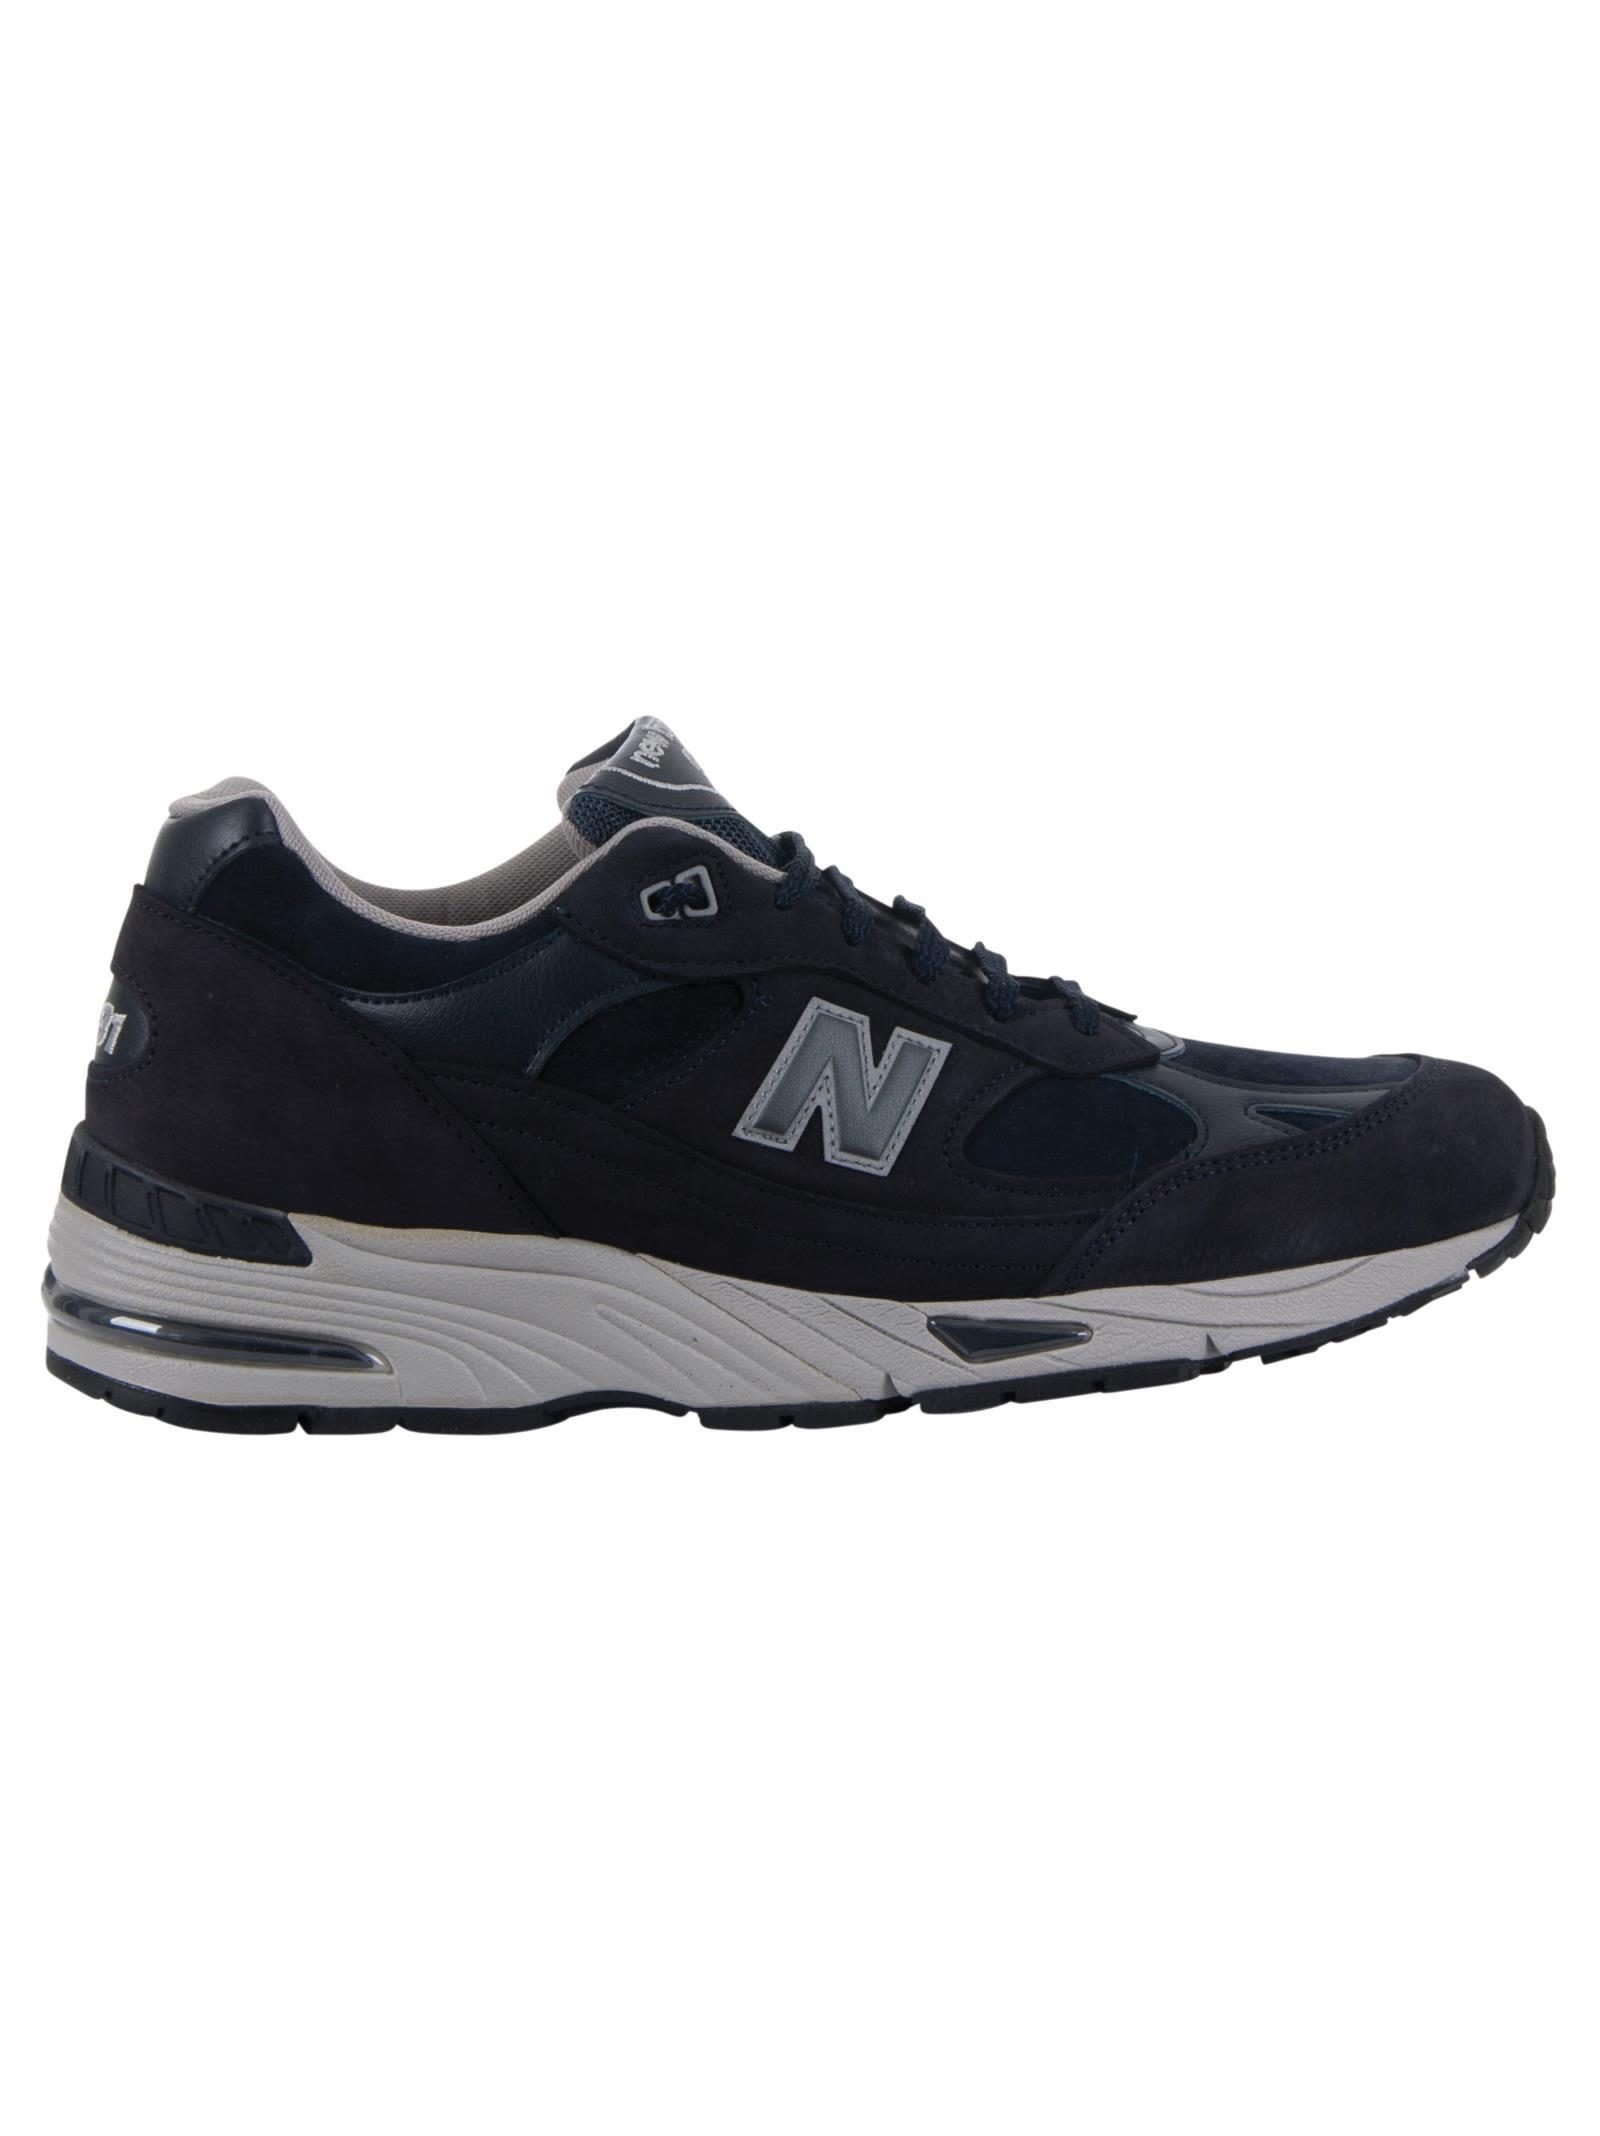 New Balance M991 Npn